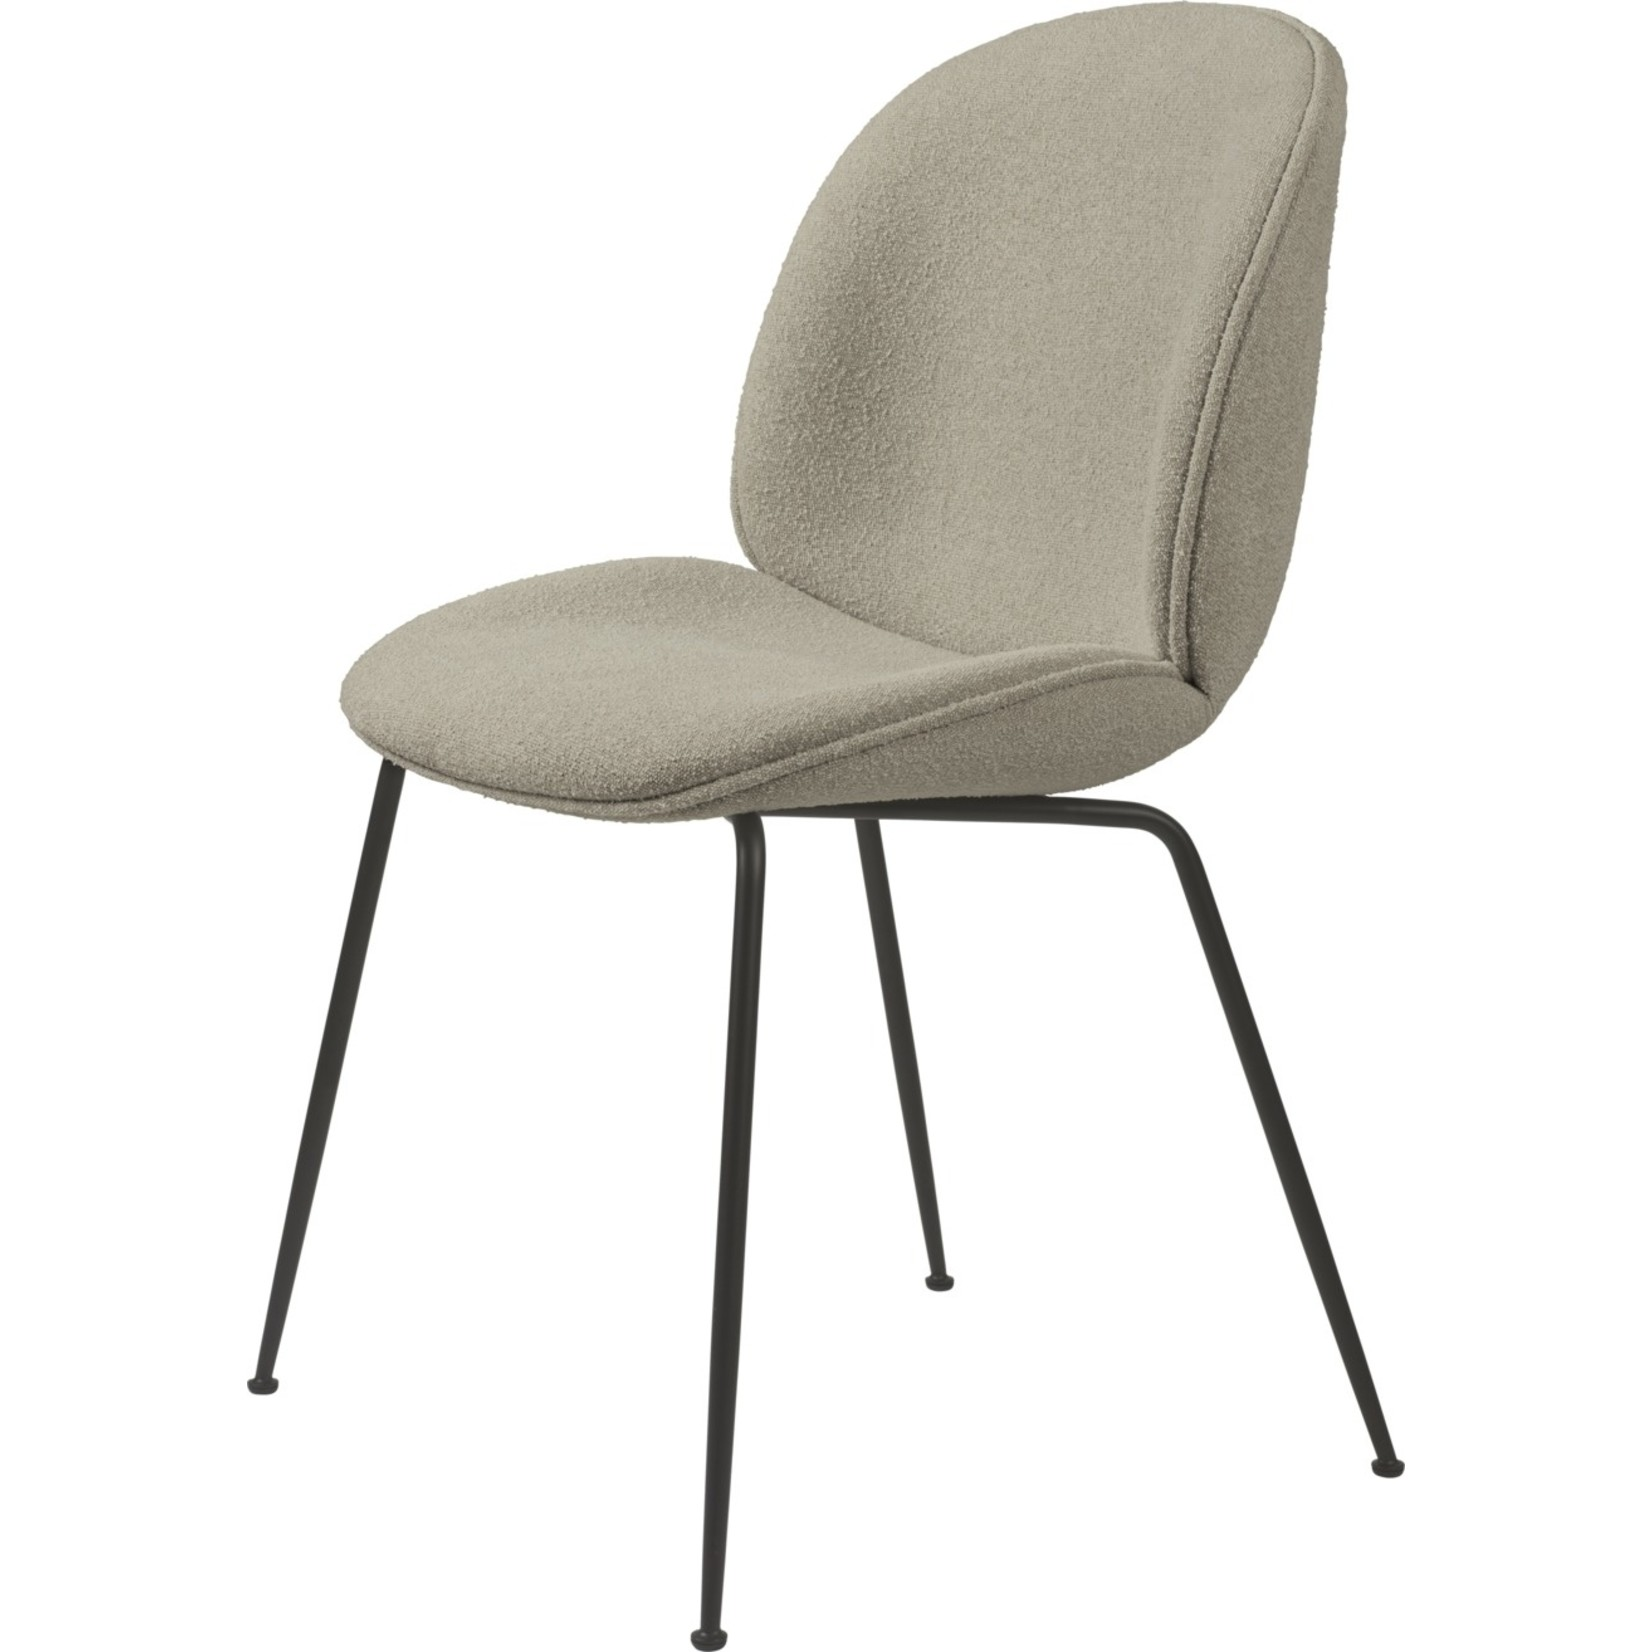 Gubi Chaise de salle à manger Beetle   Light Boucle 008 & Base Noir Mat